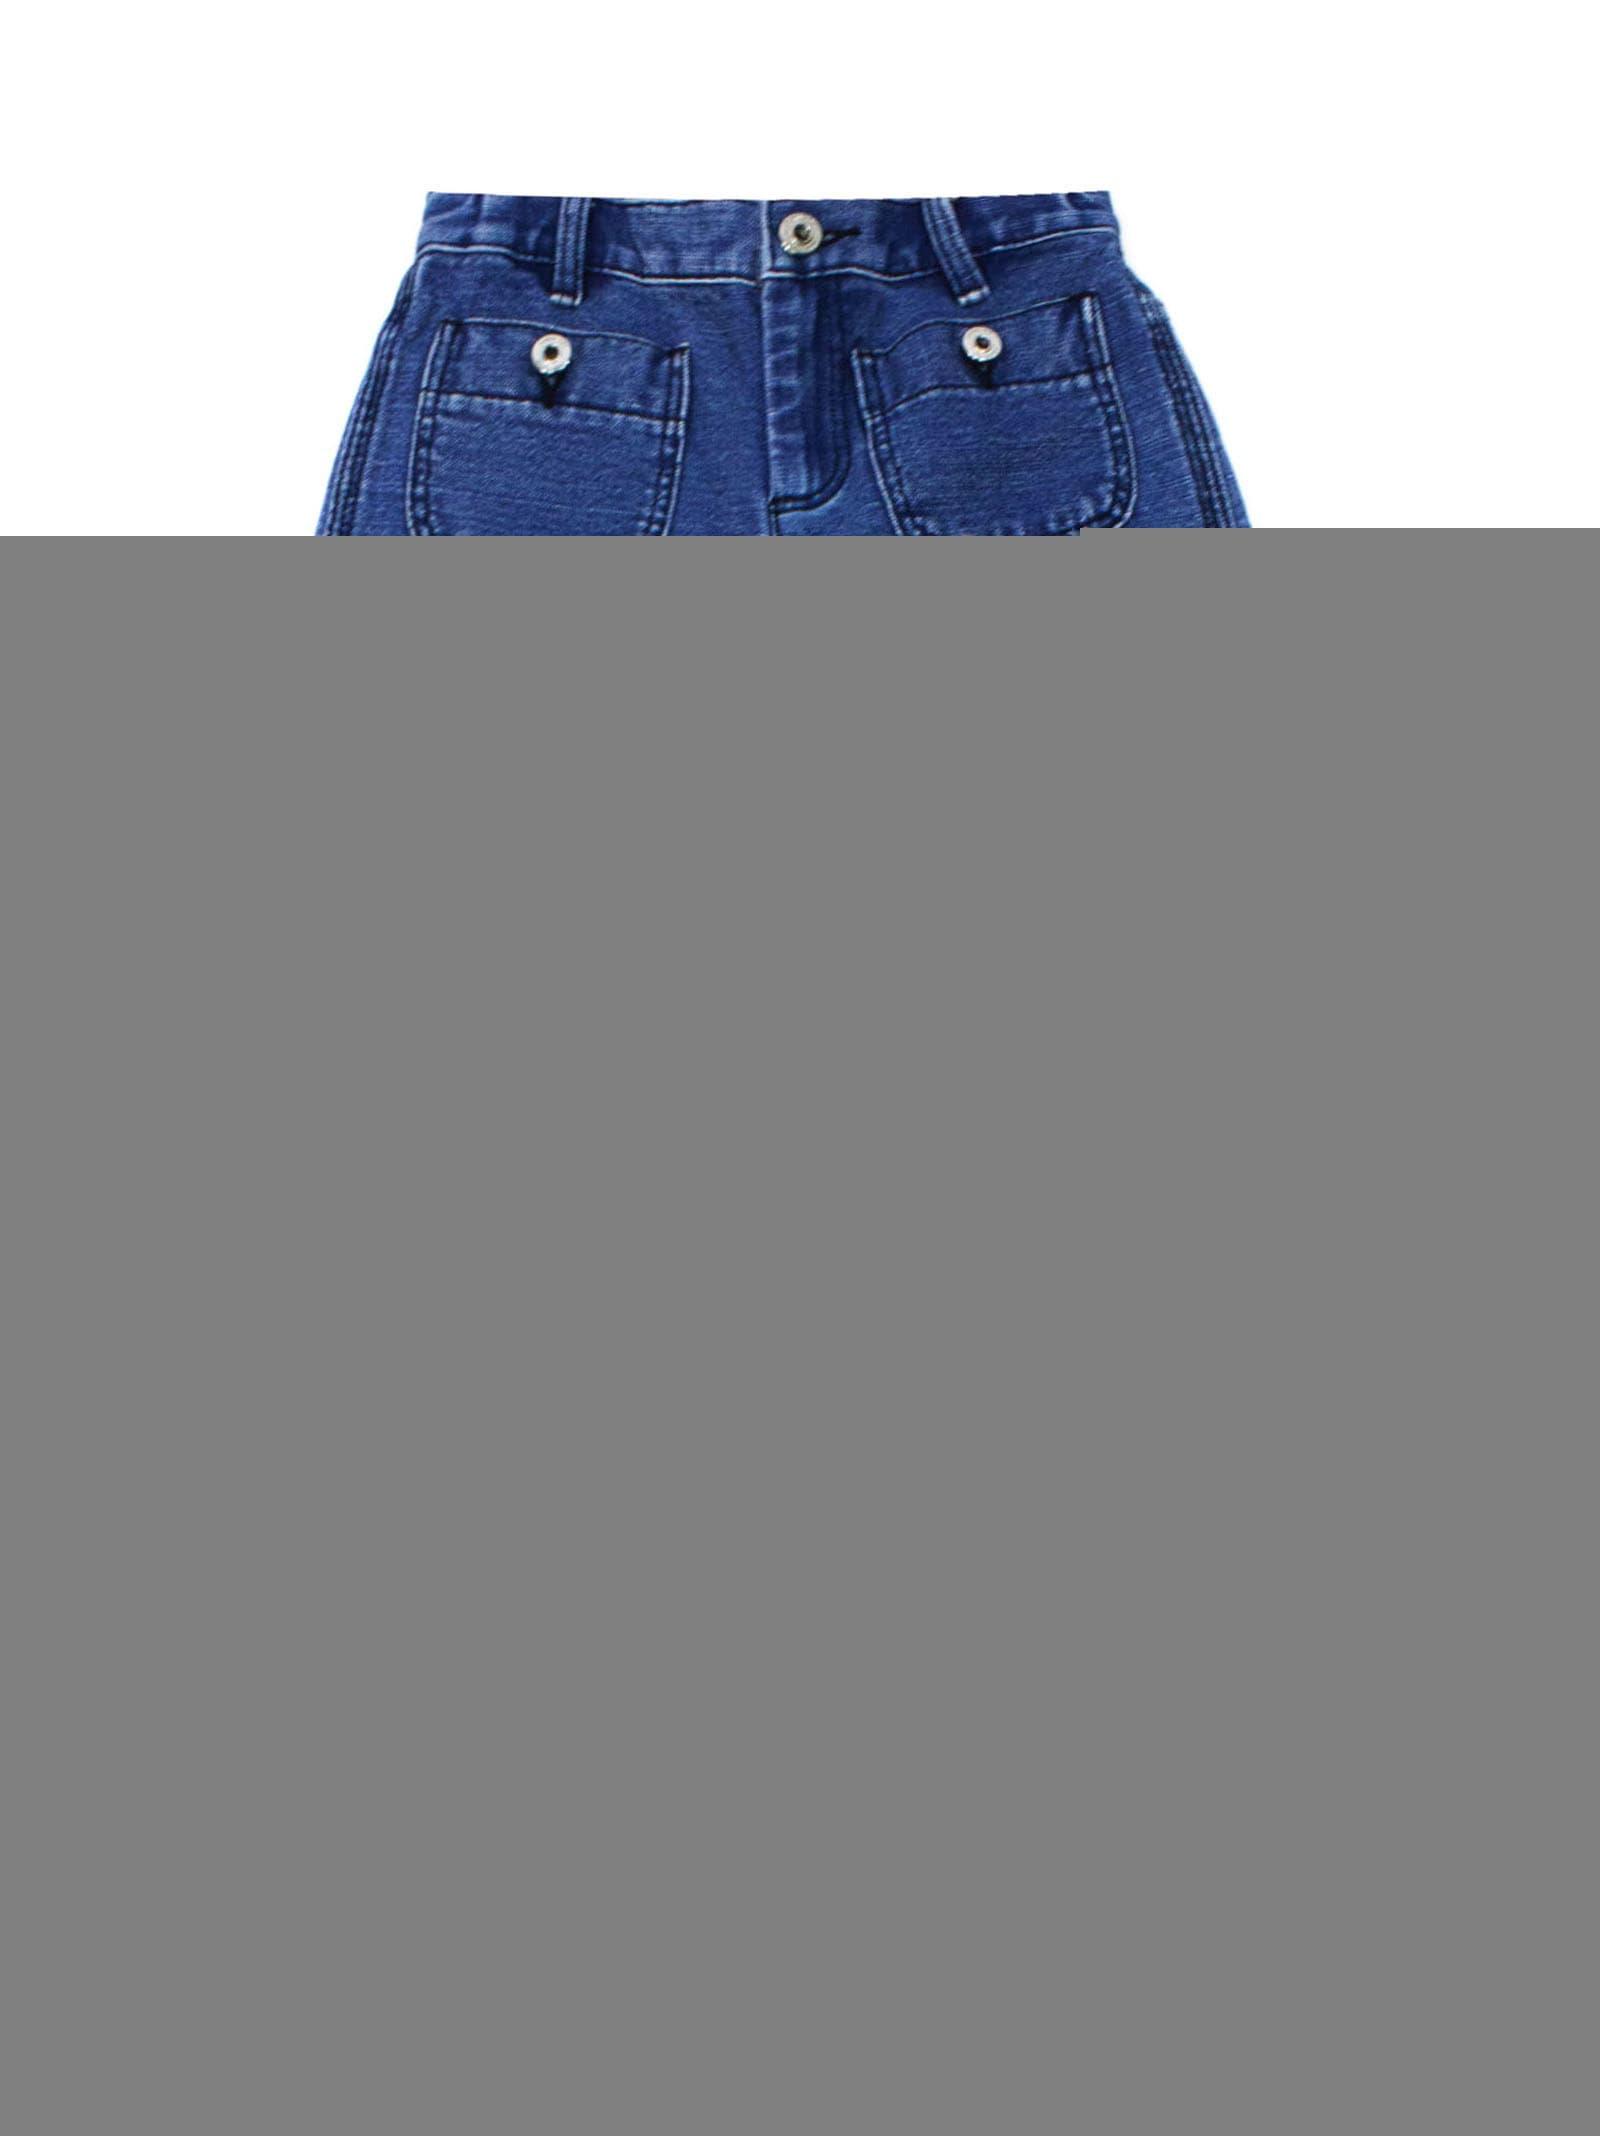 Burberry Kids' Blue Cotton-linen Blend Logo Print Jeans